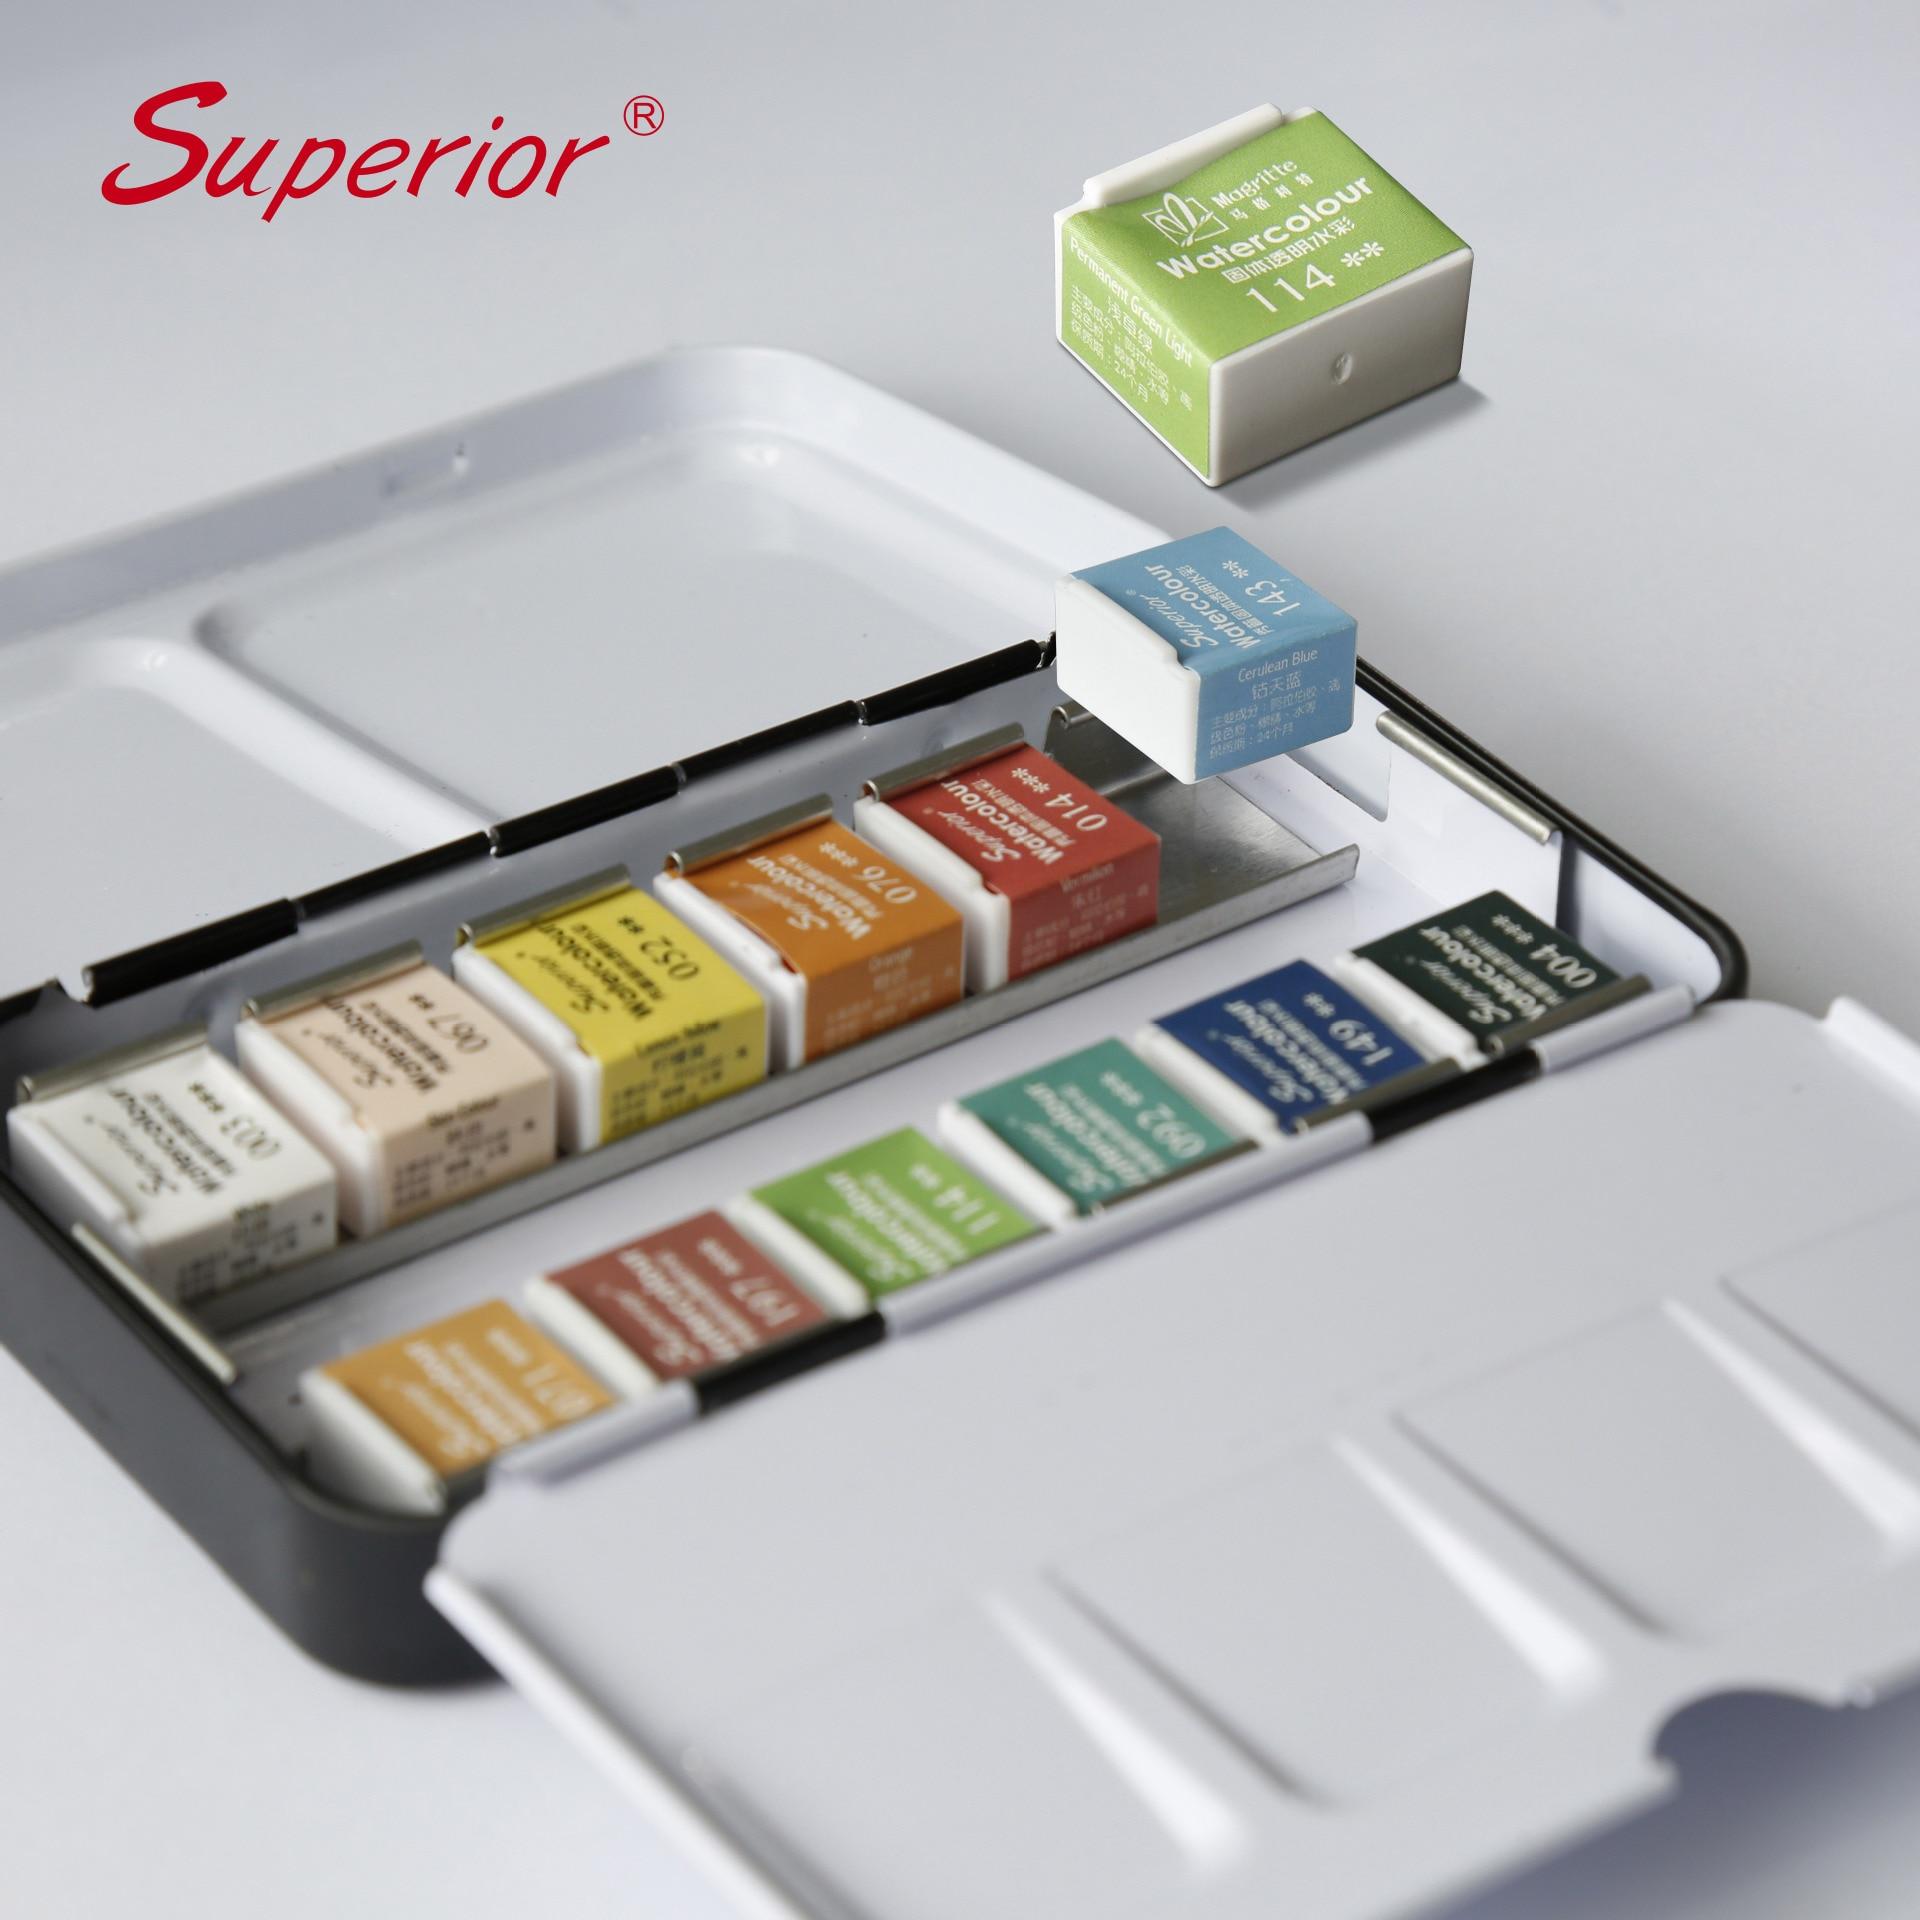 Superior 12/24/36/48 Colors Pigment Solid Watercolor Paints Set With Paintbrush Watercolor Pigment Set Art Supplies